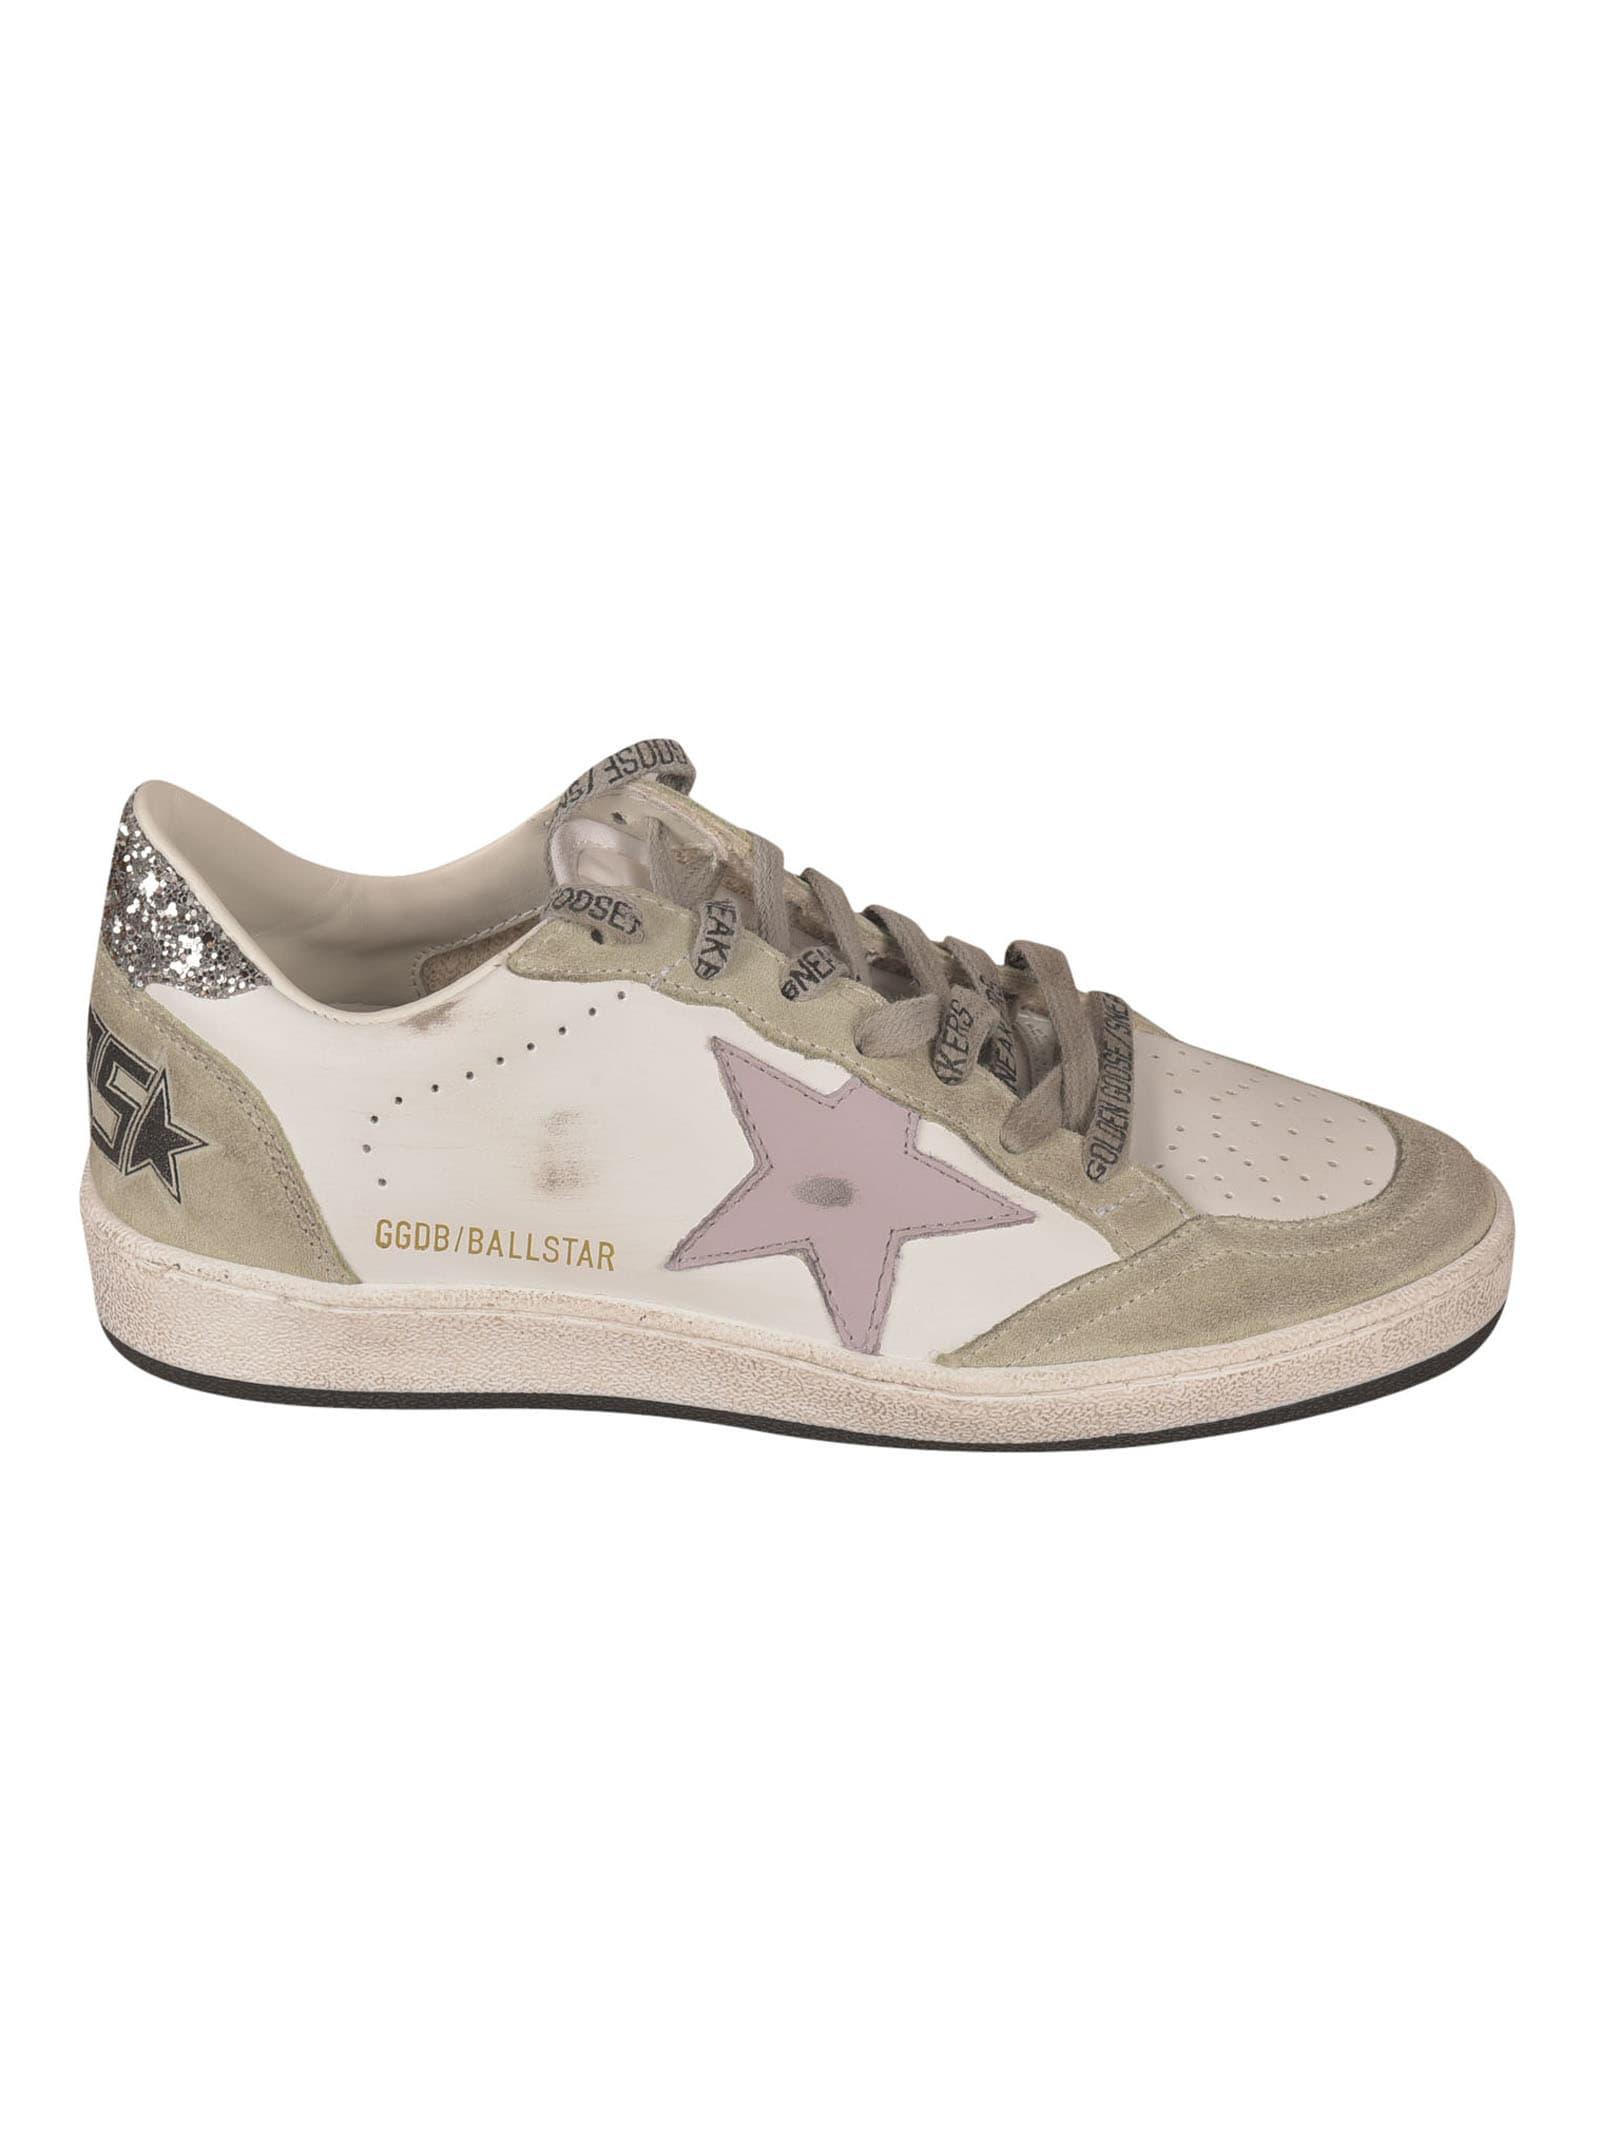 Golden Goose Ball-star Sneakers